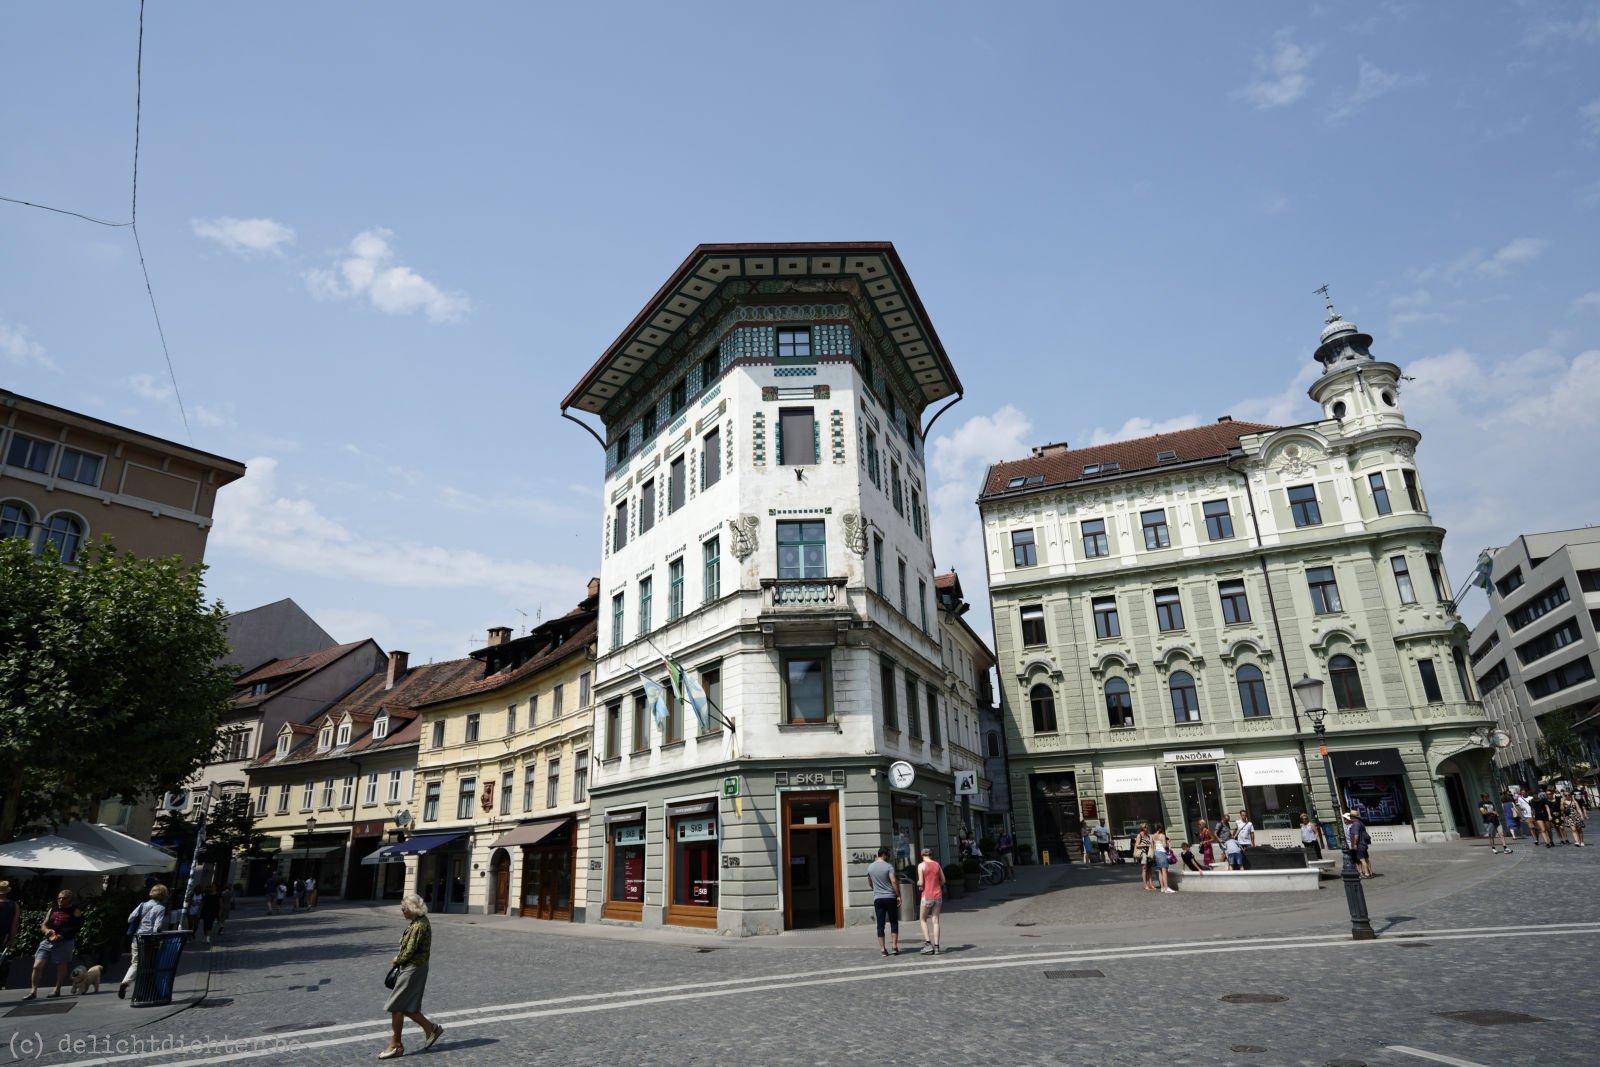 2018_07_Slovenie_20180720_101009_DxO_PL1_1600px